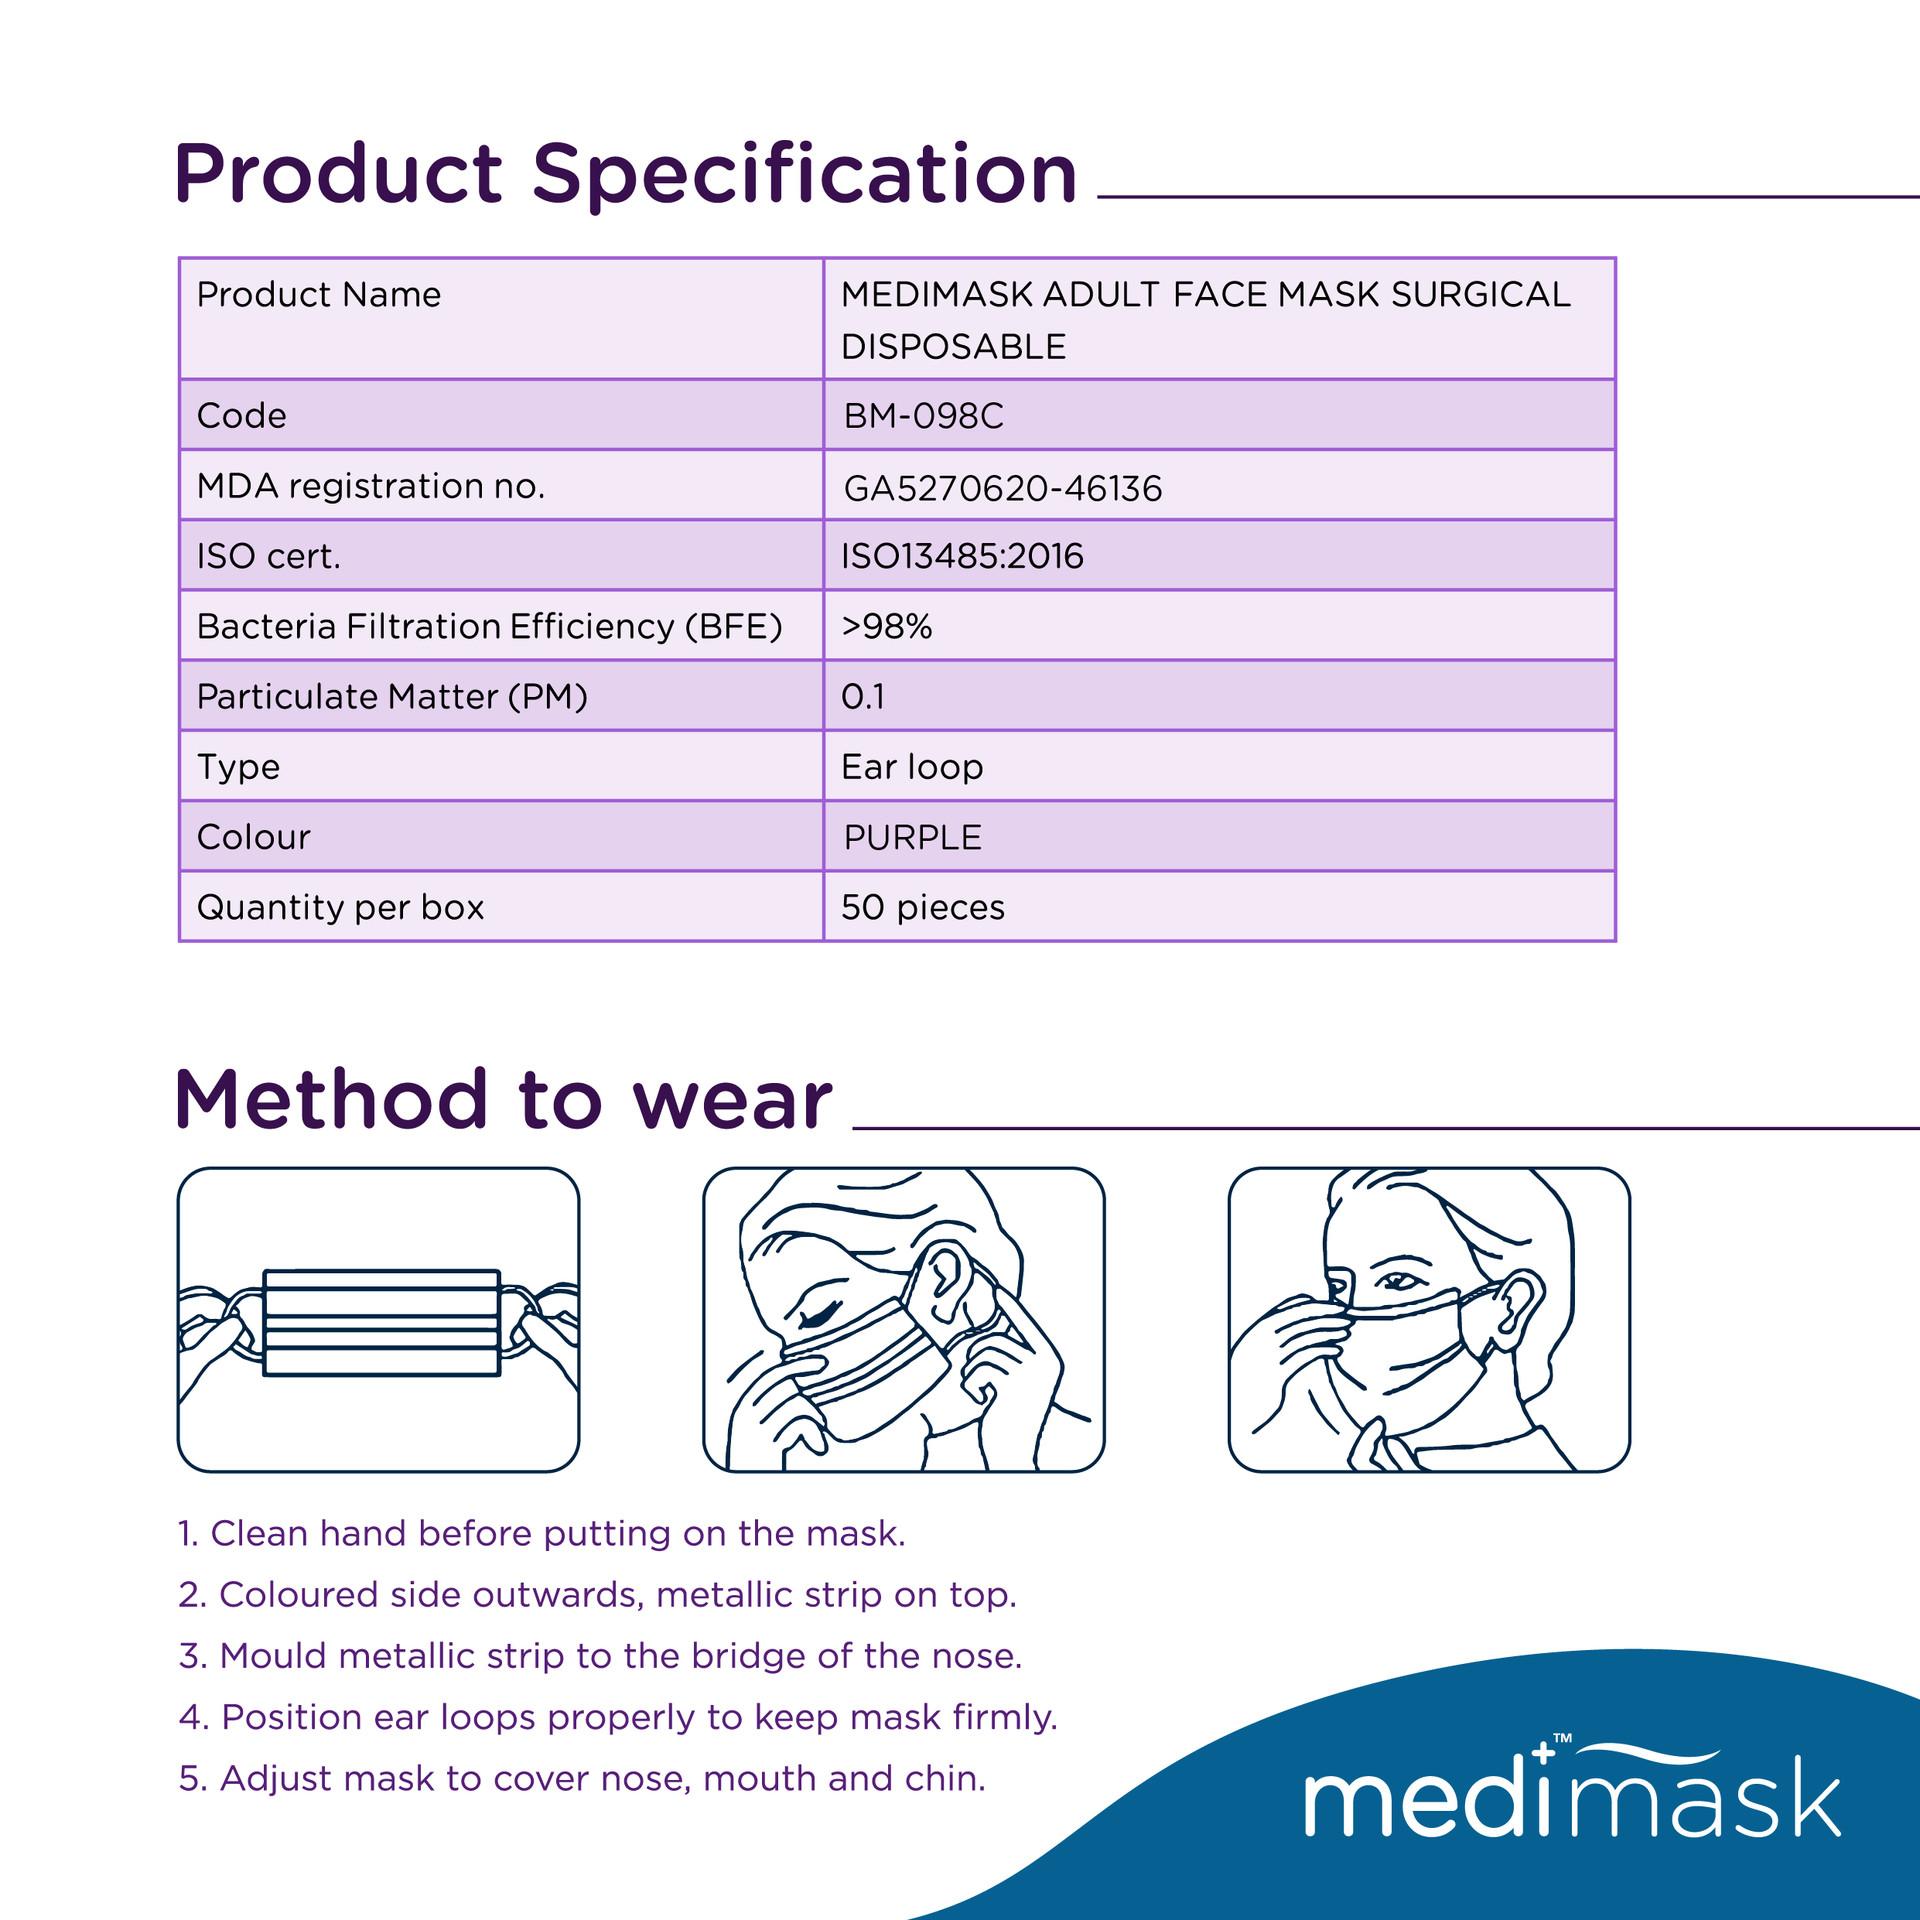 medimask 98 type 2 purple_POSM-08.jpg